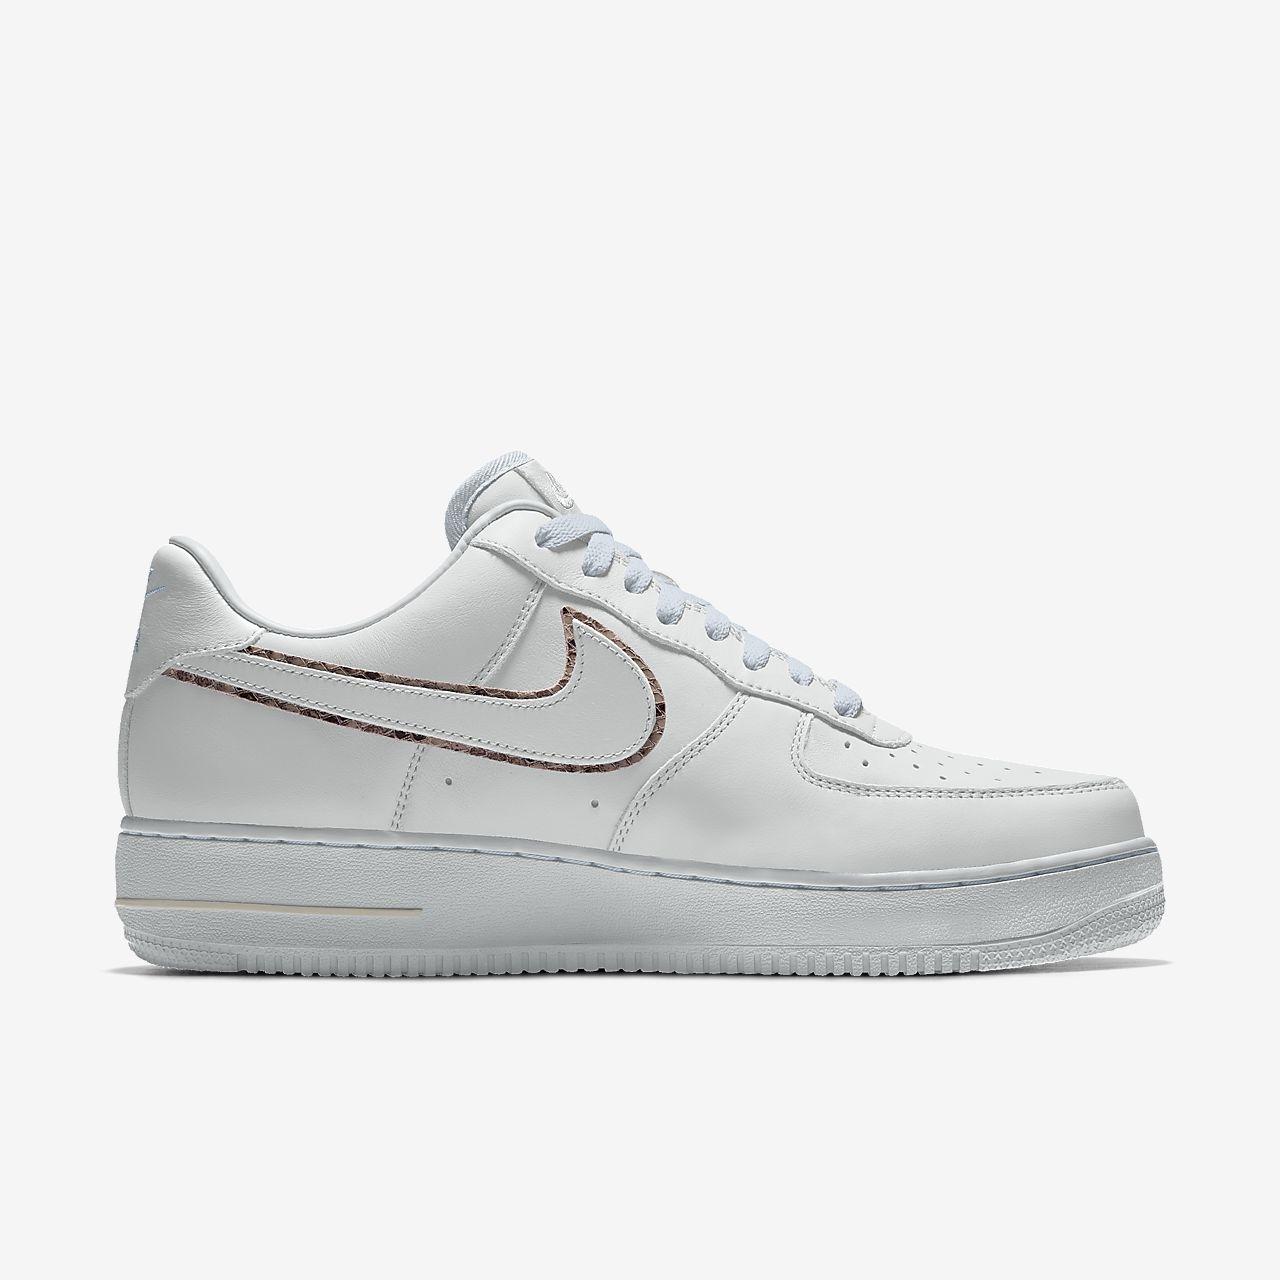 Nike Air Force 1 Low Unlocked By You Custom Women's Shoe